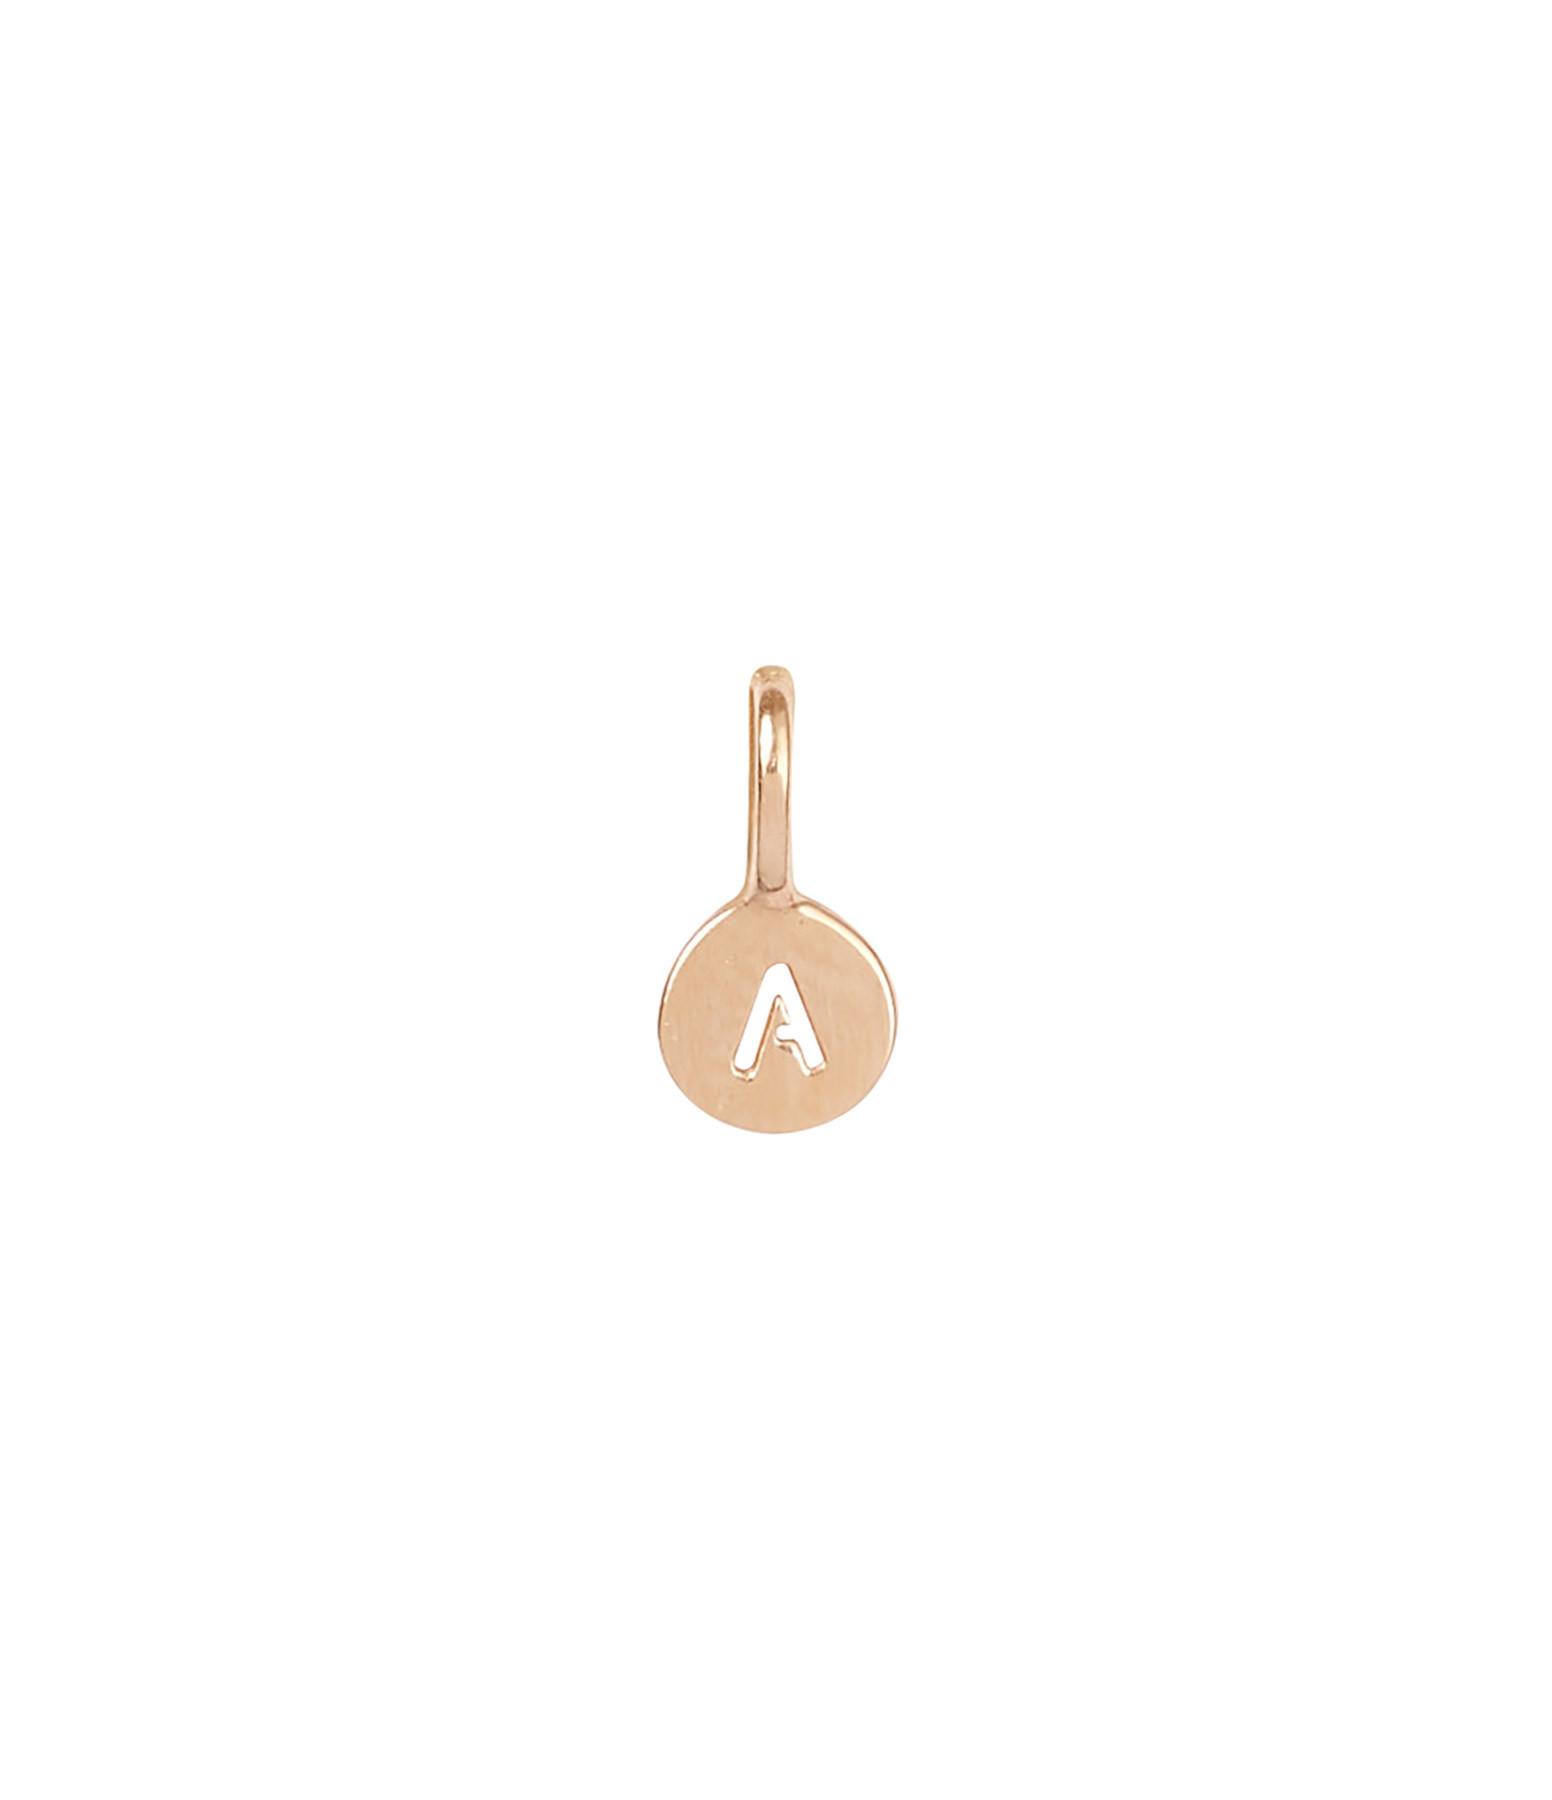 ORADENA - Médaille Or Lettre Ajourée